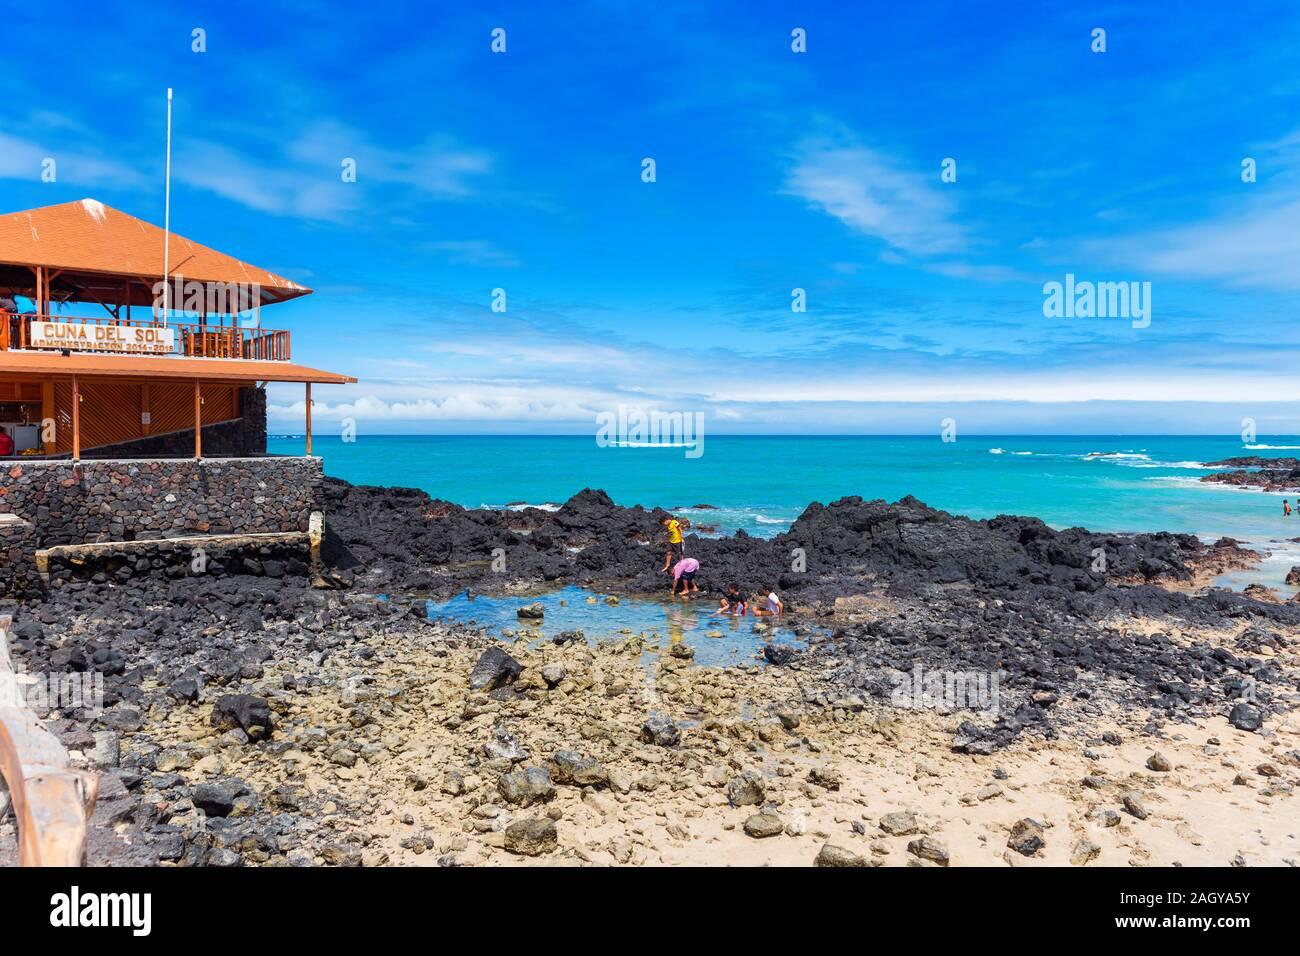 Galapagos Island Isla Isabela July 2 2019 View Of The